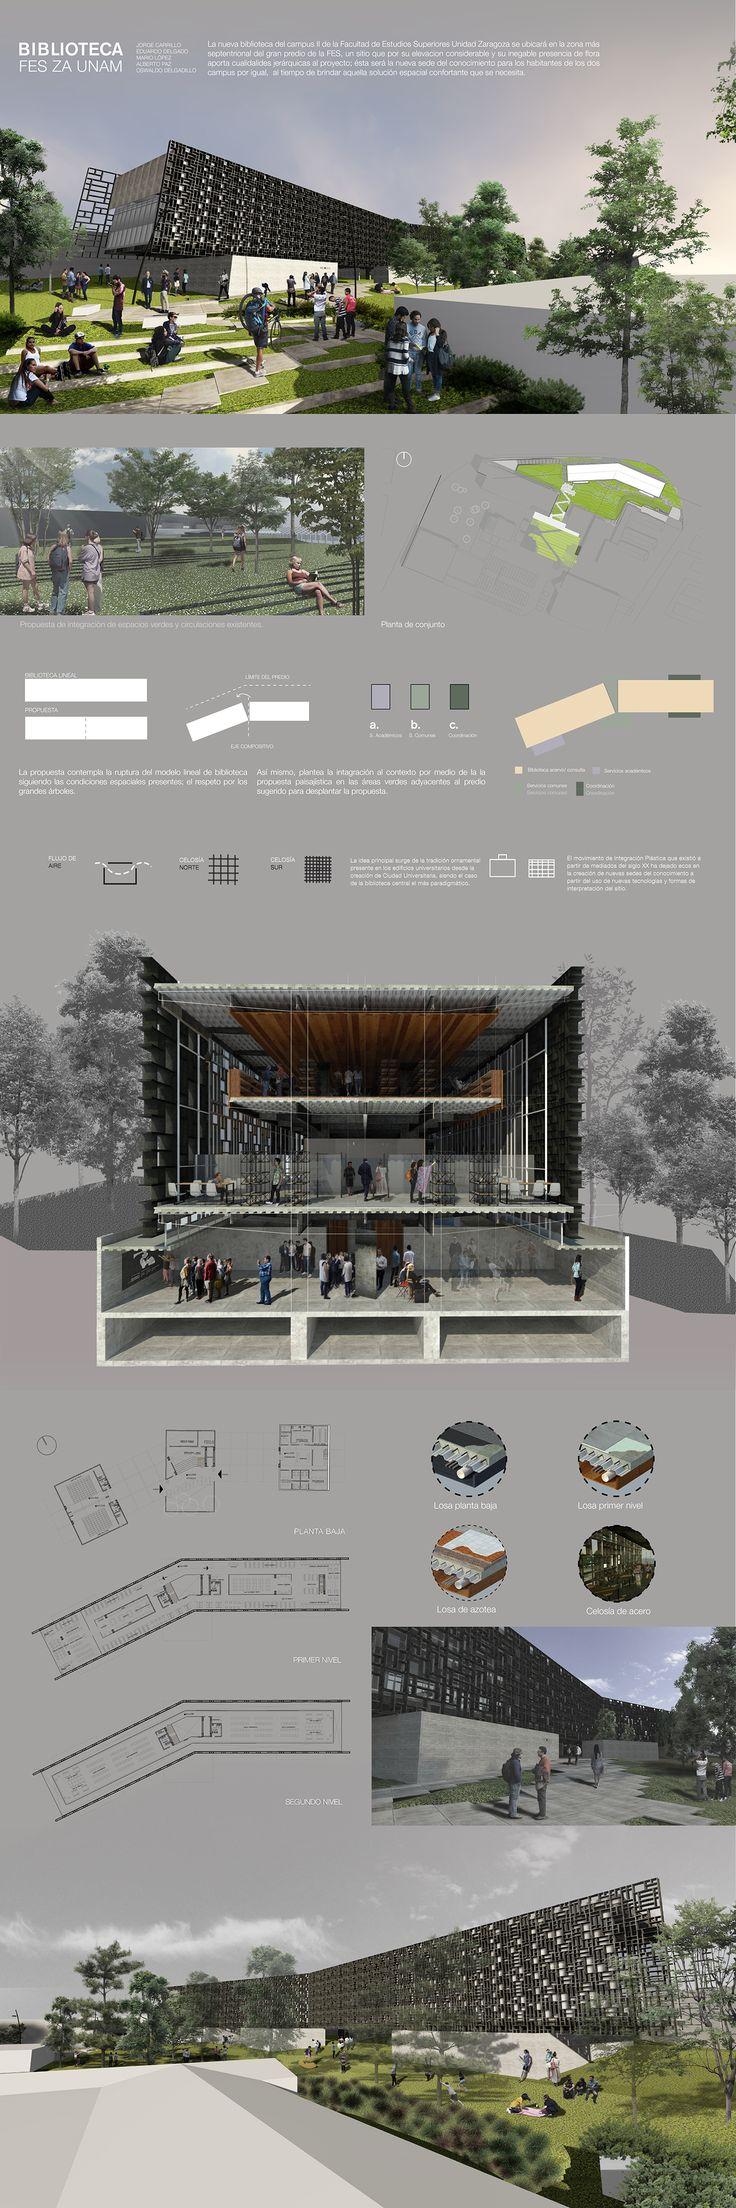 Biblioteca FES ZA UNAM on Behance